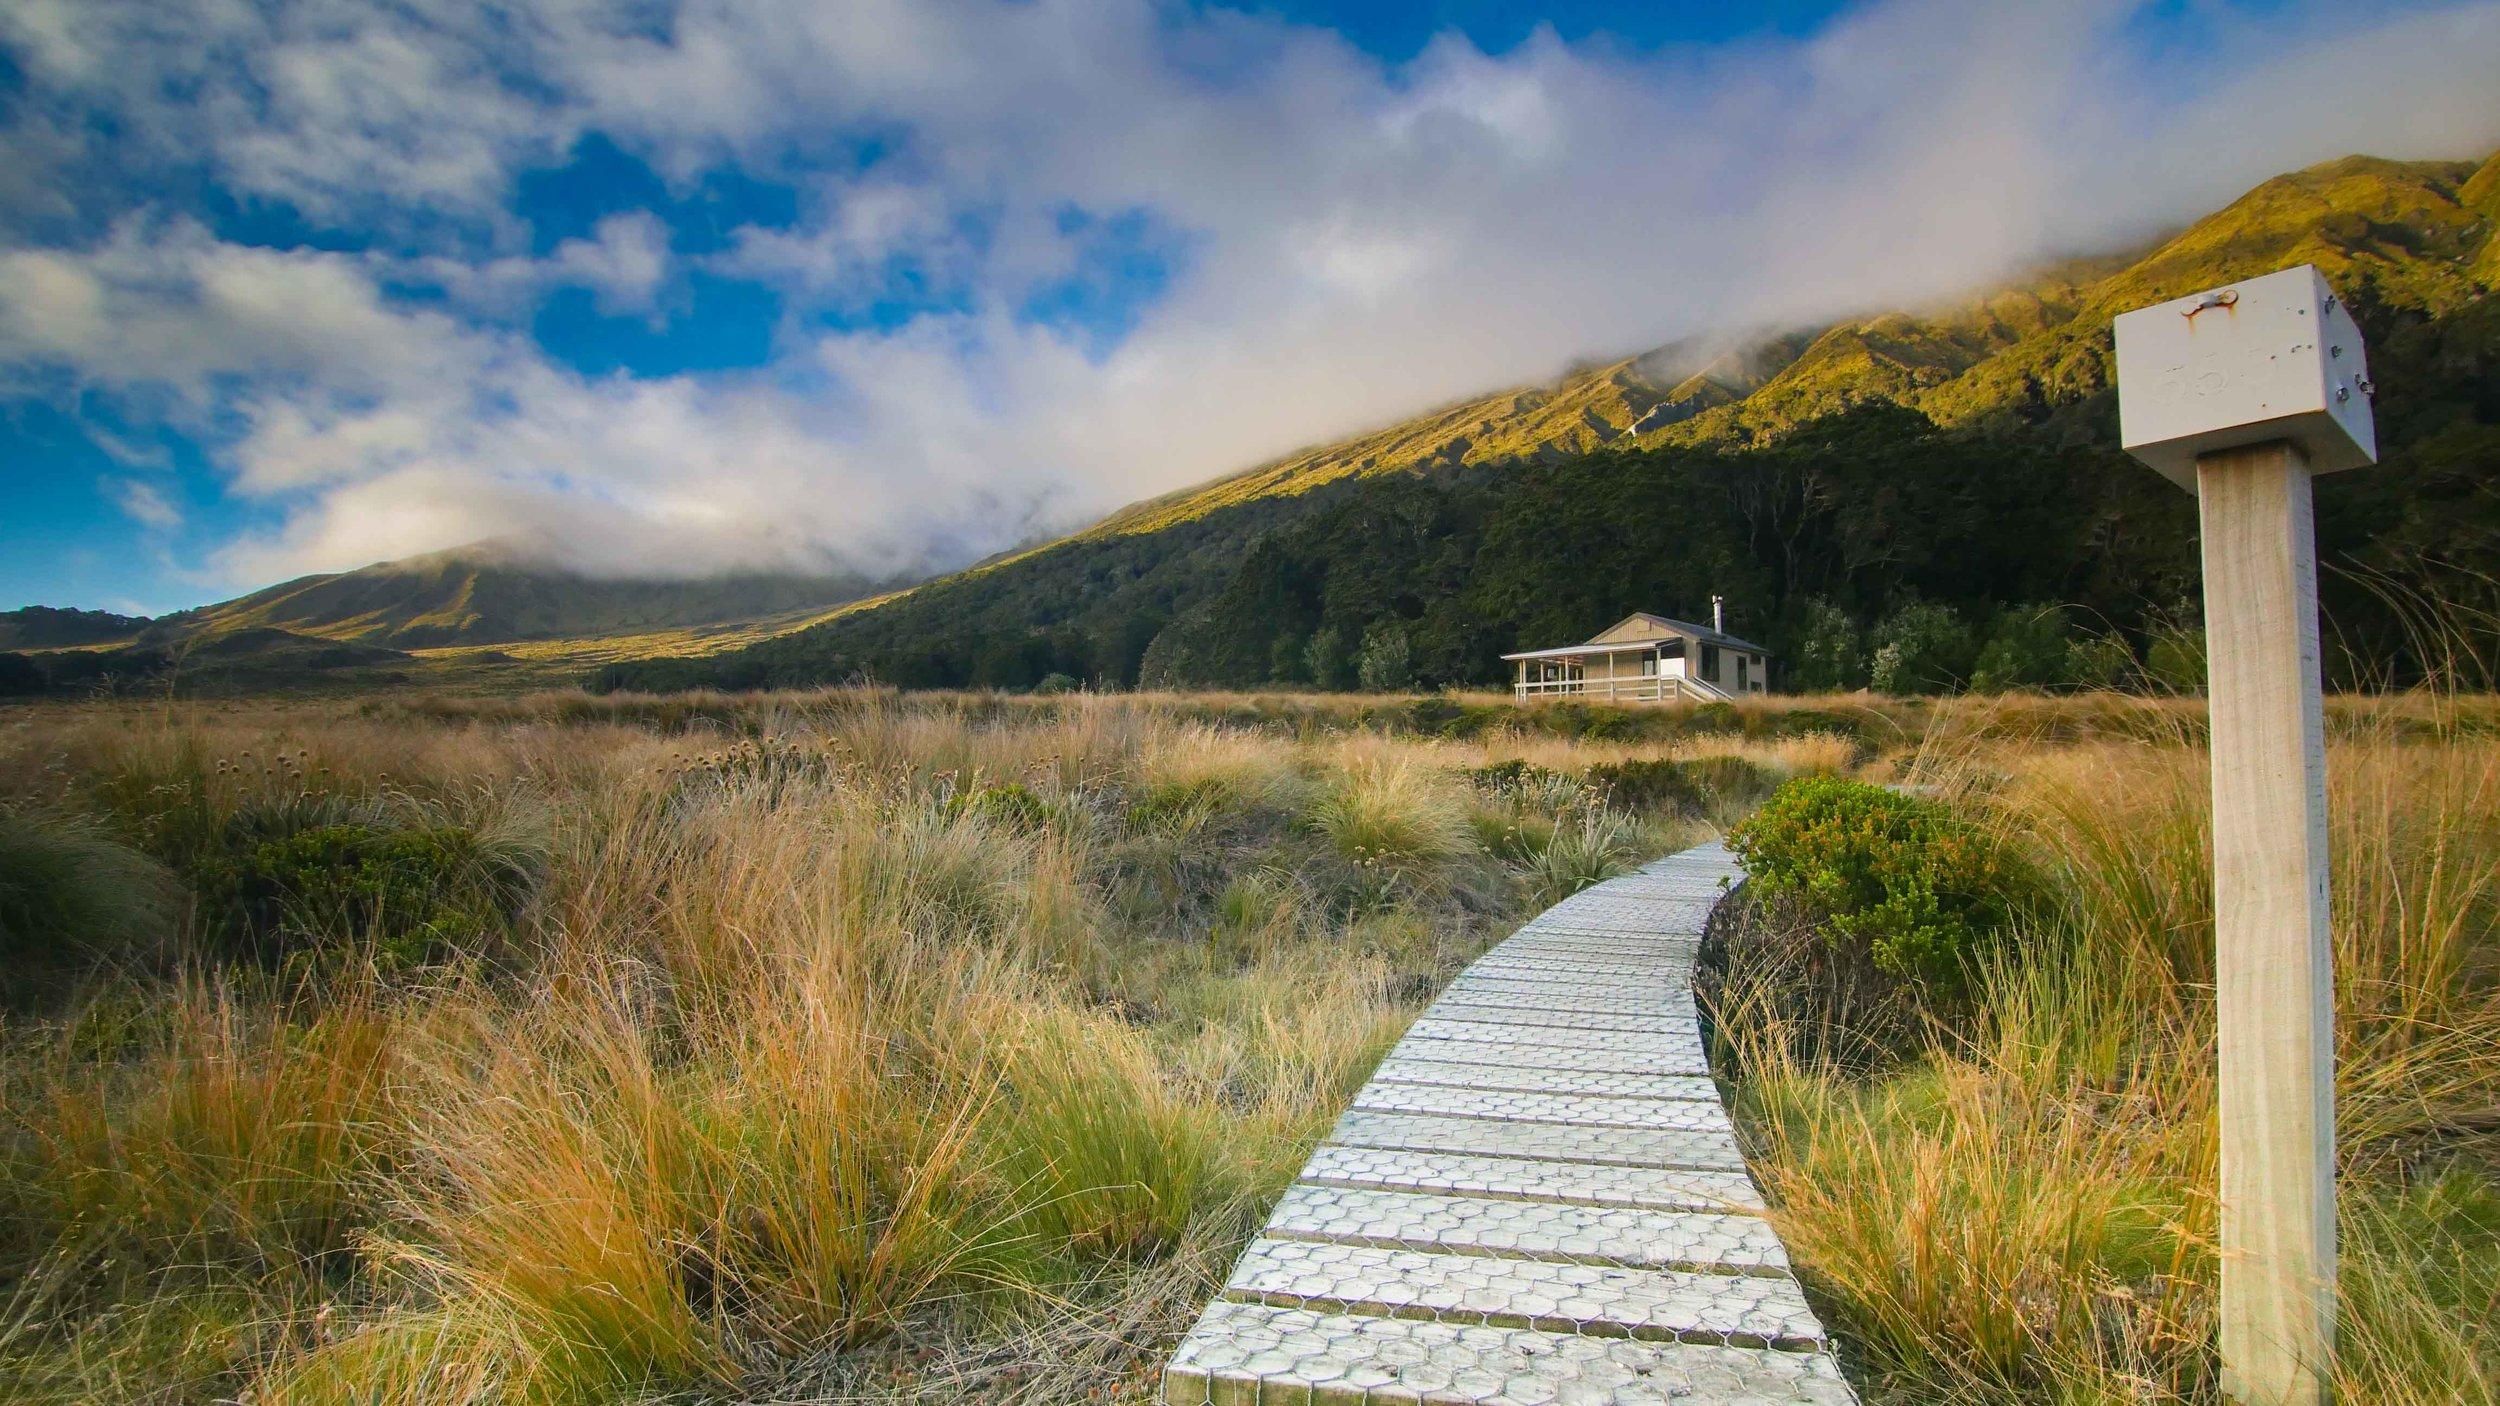 Green Lake Hut Lake Monowai Fiordland NAtional Park New Zealand (5 of 9).jpg